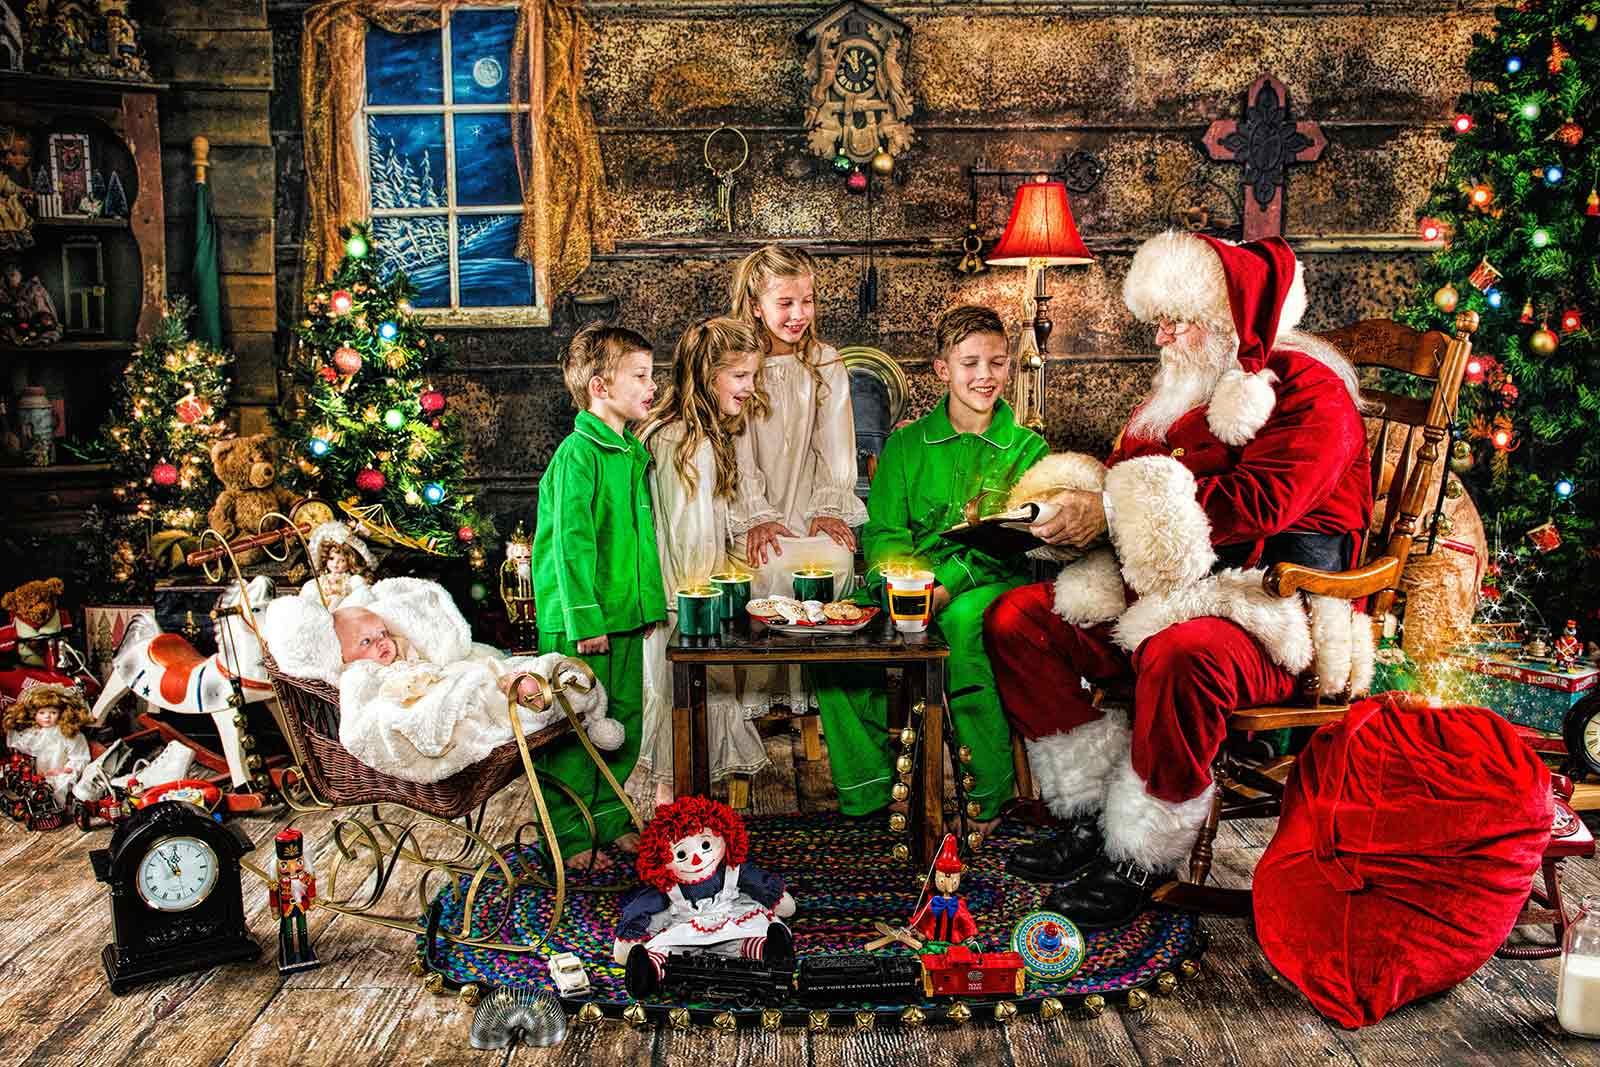 014_Magic-of-Santa-Anna-Thielen-Photography